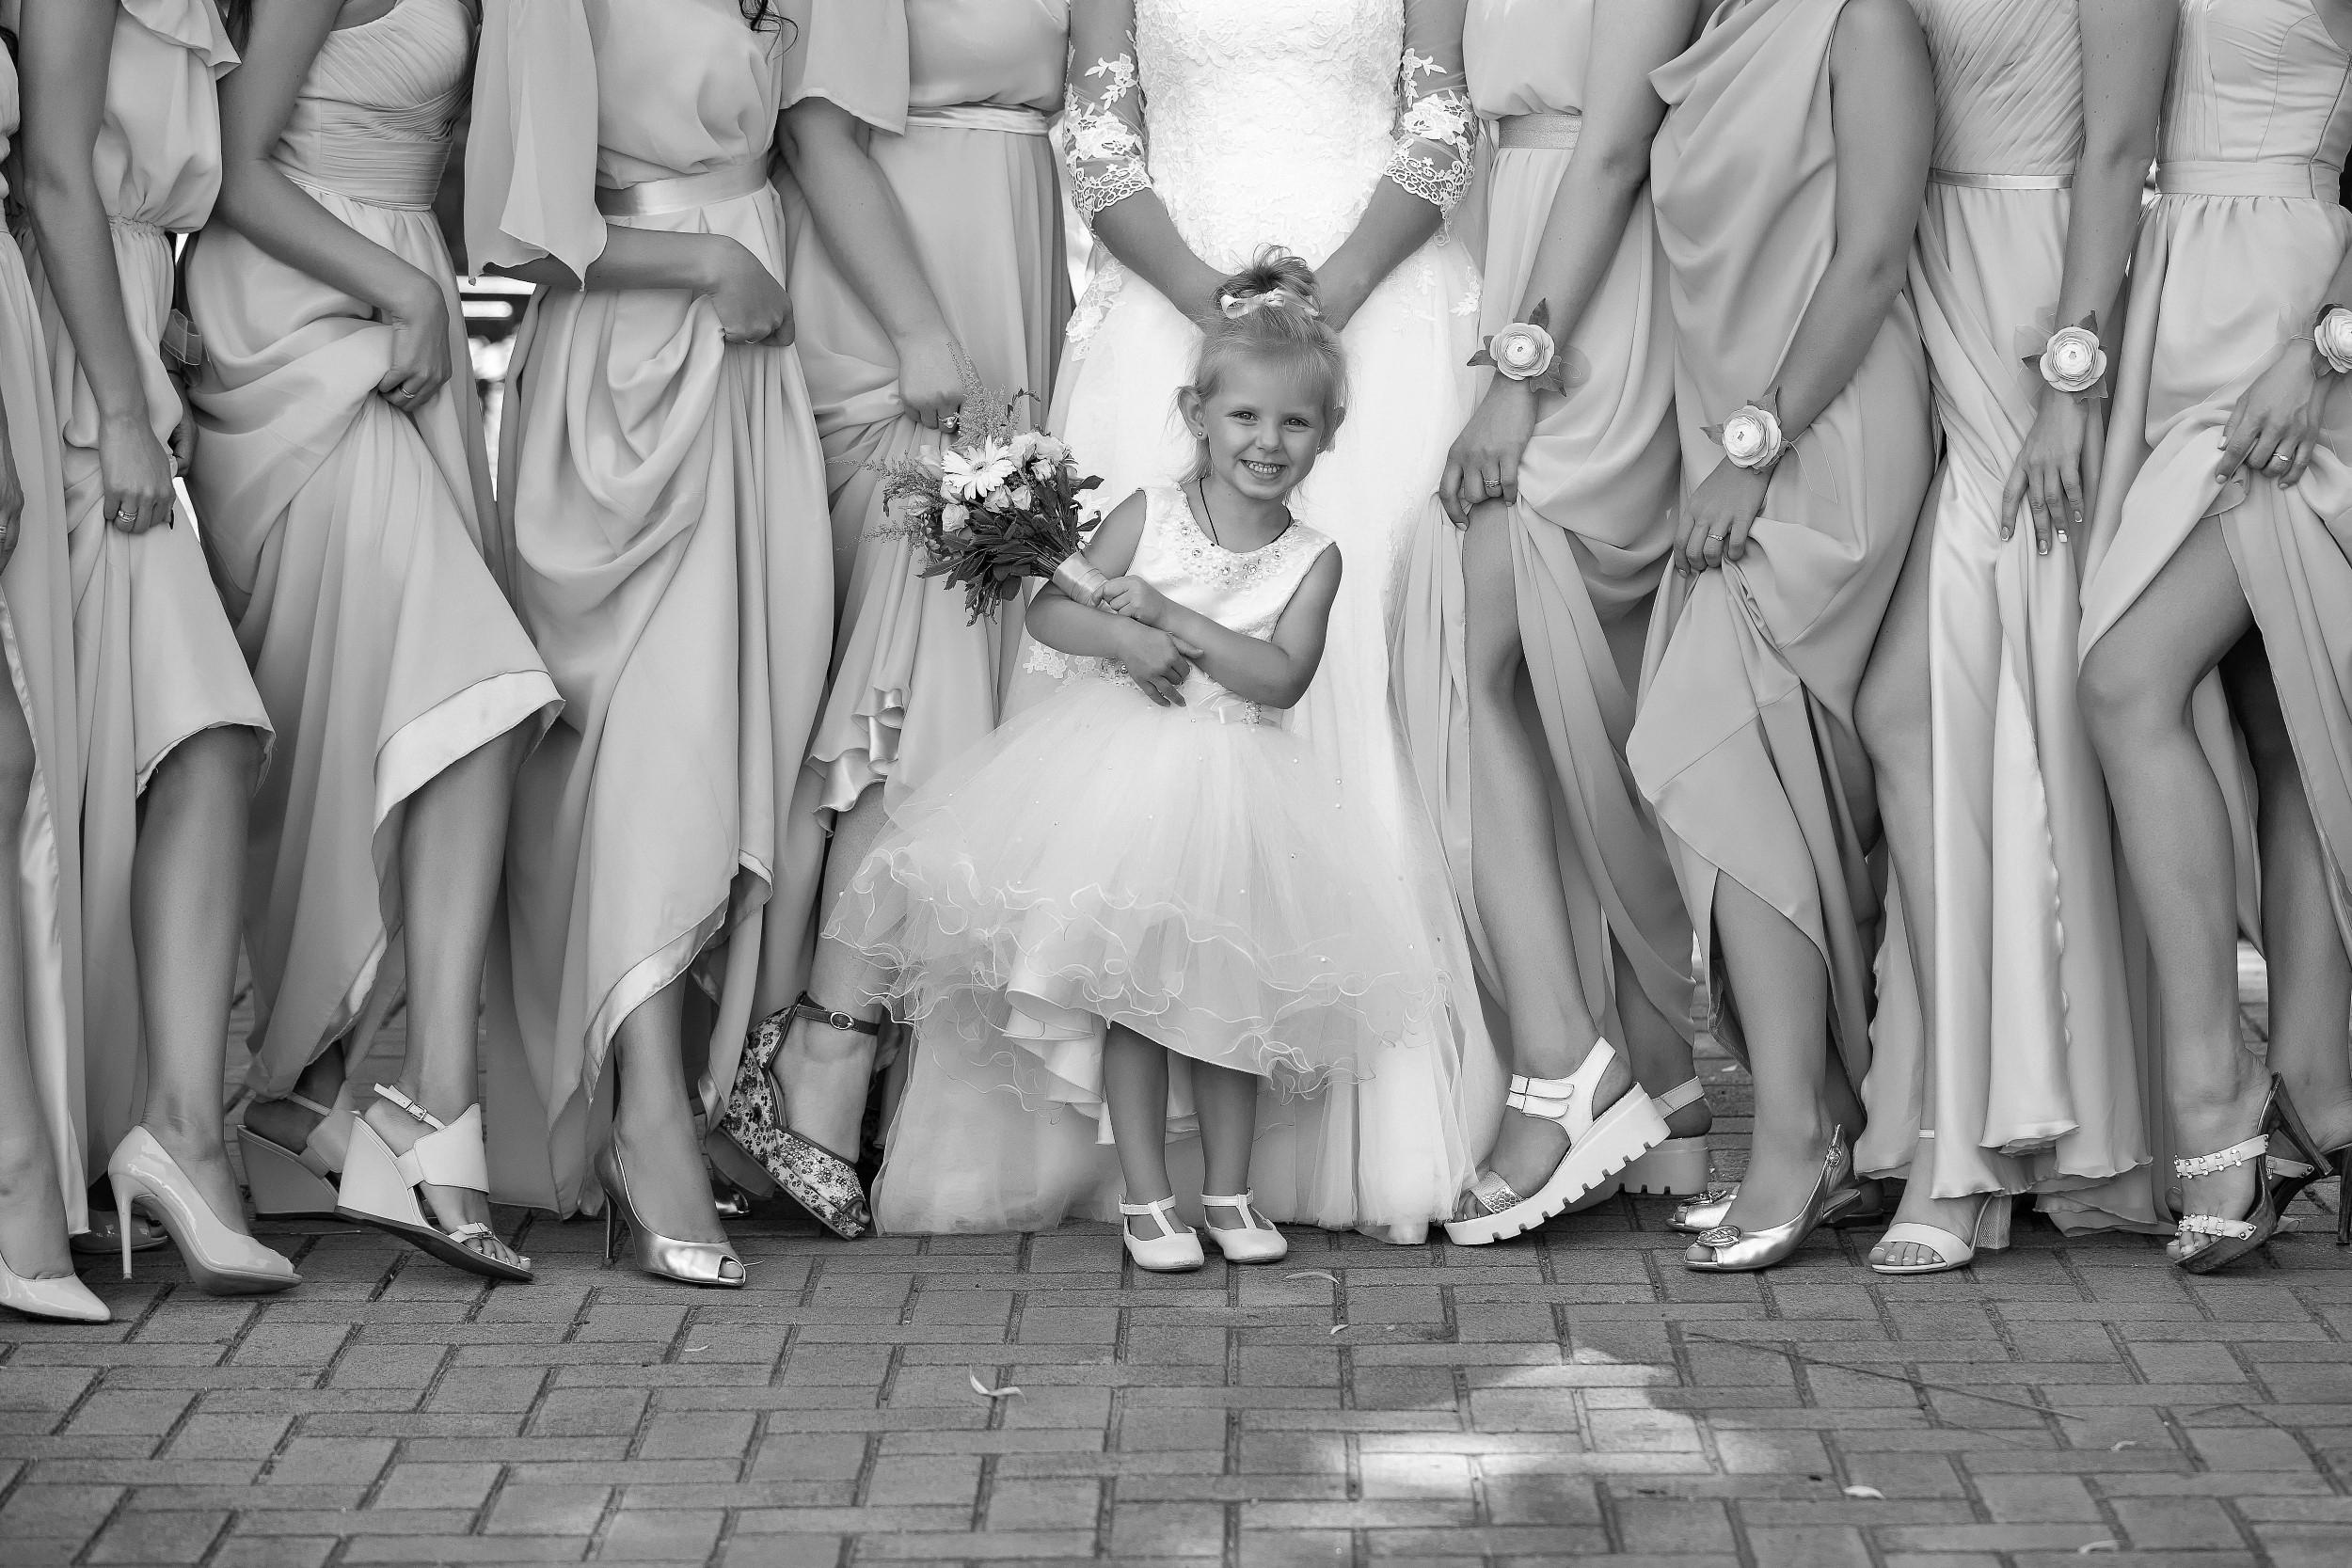 CANON WEDDING BRIDESMAIDS WITH BRIDE PHOTO AWARDS 003452 (Custom)